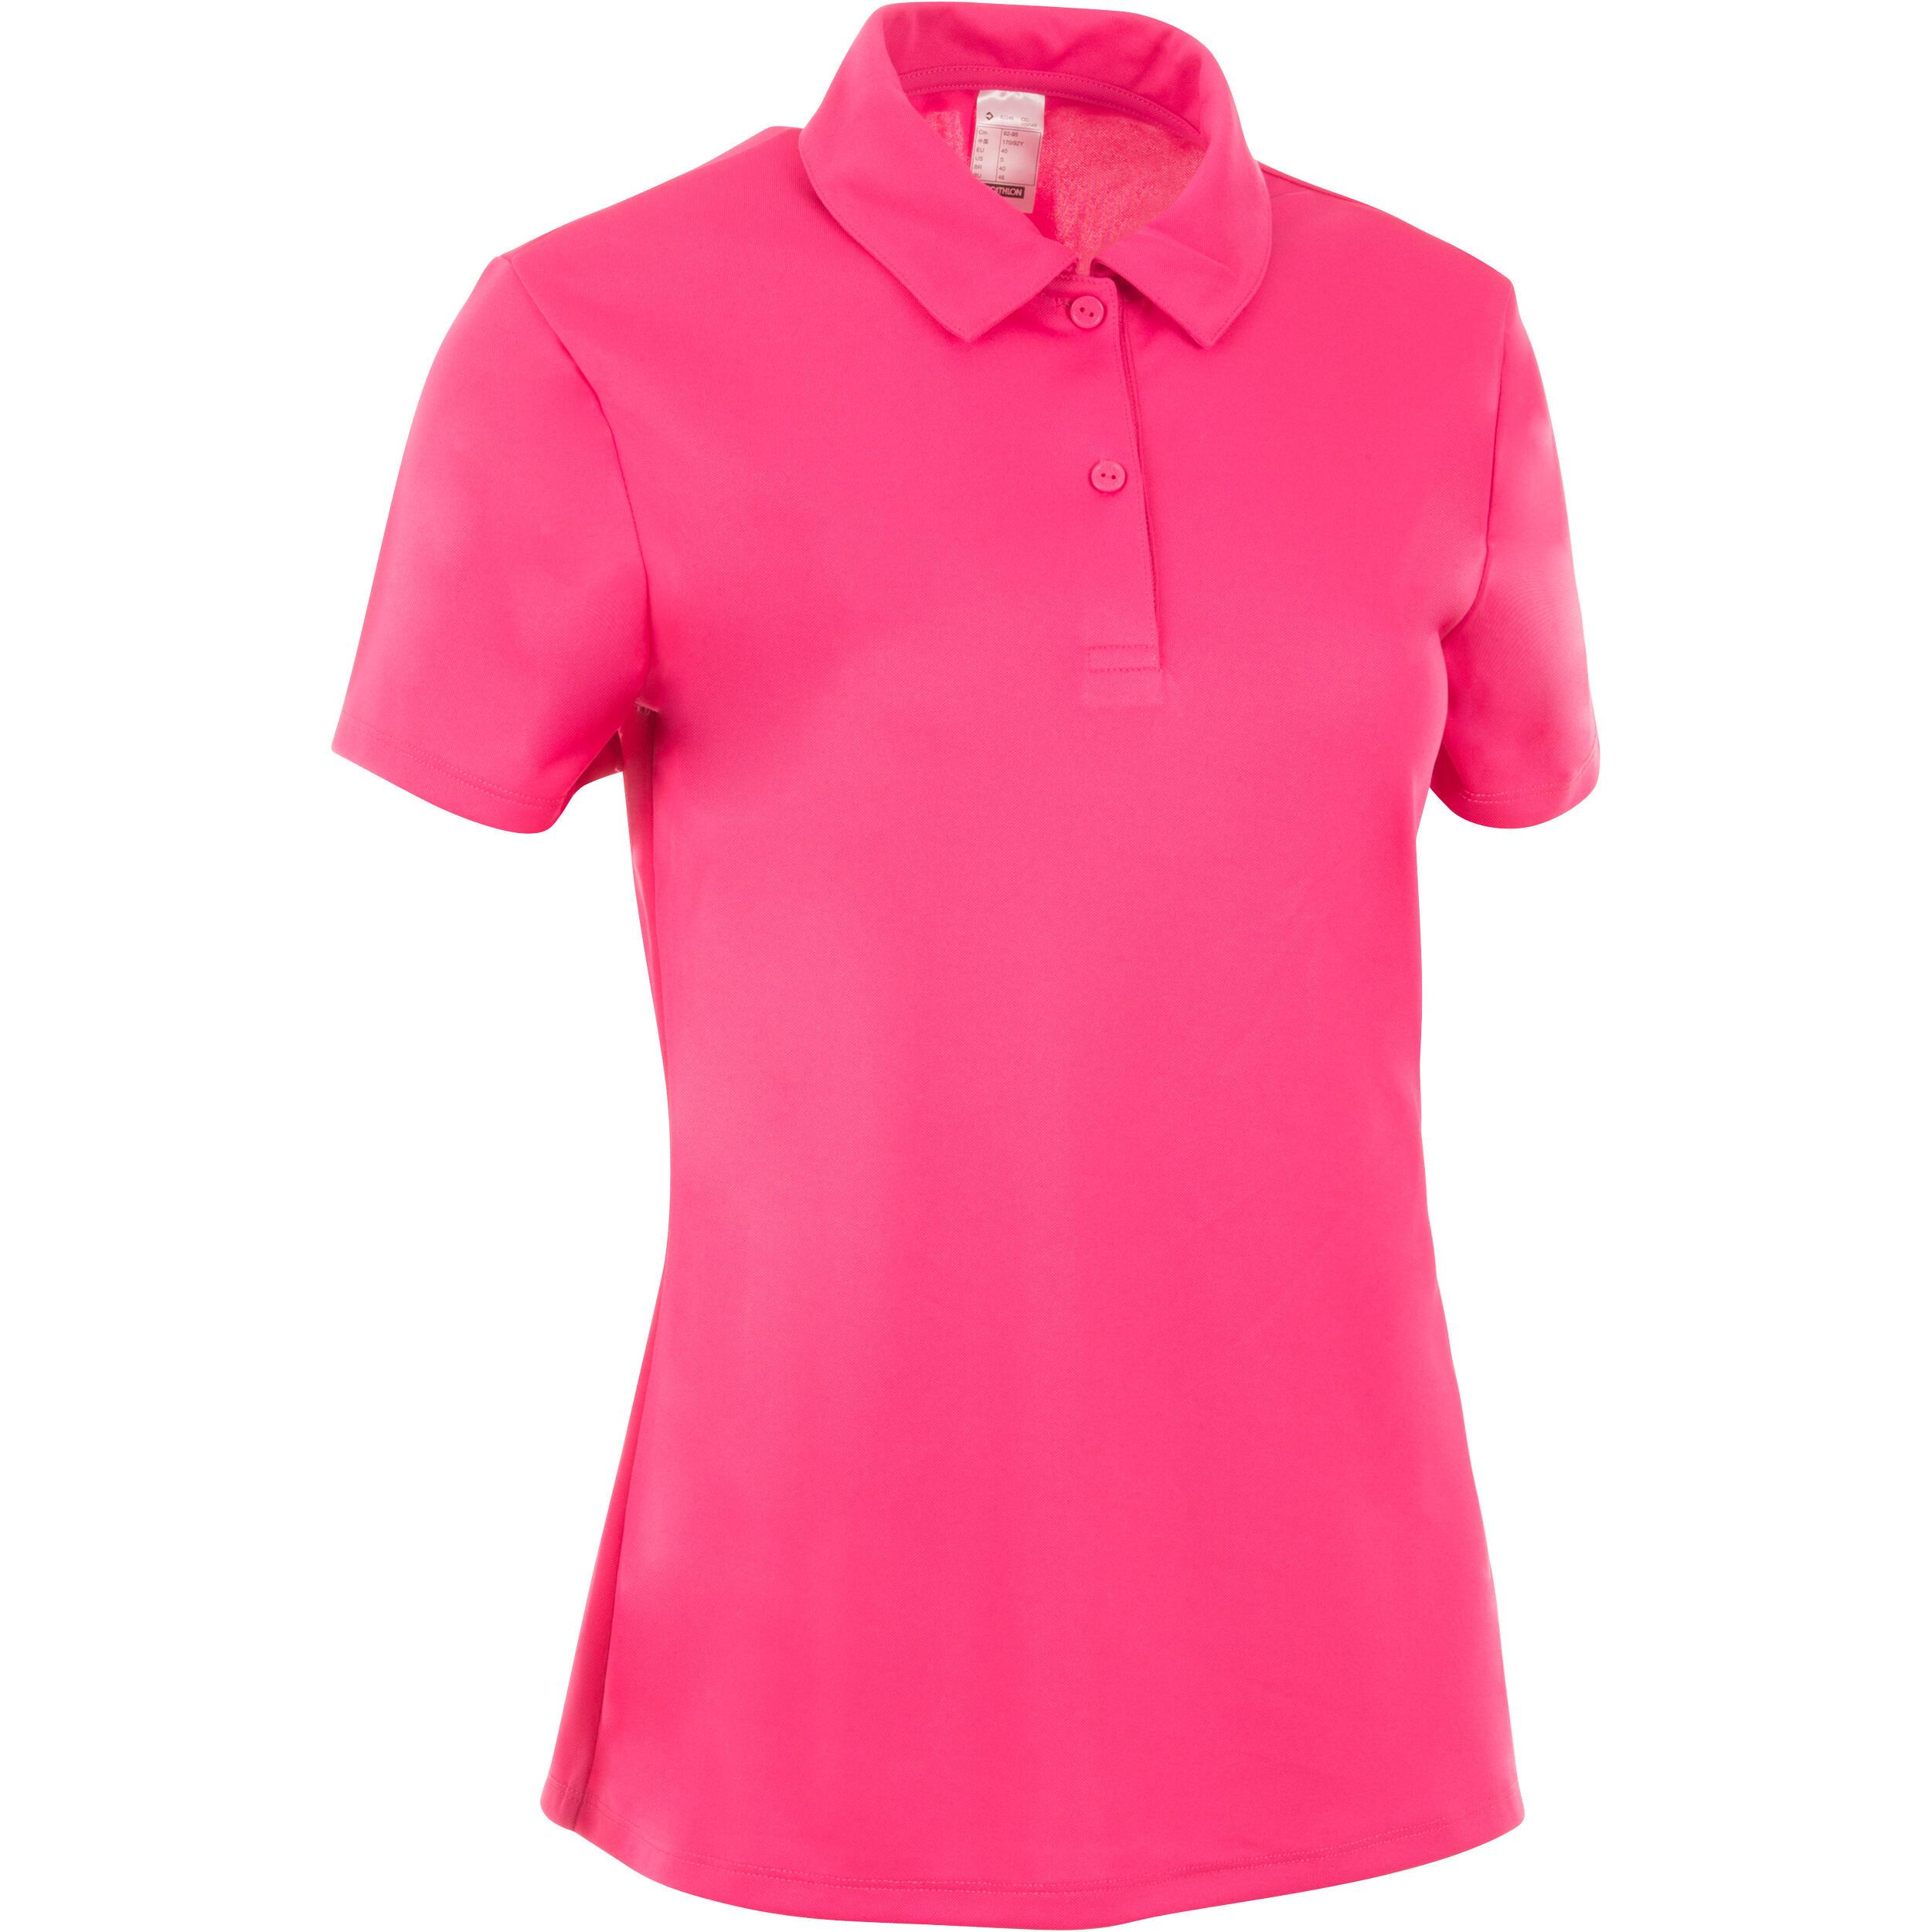 Artengo Damespolo Essential wit padel/tennis/badminton/tafeltennis/squash